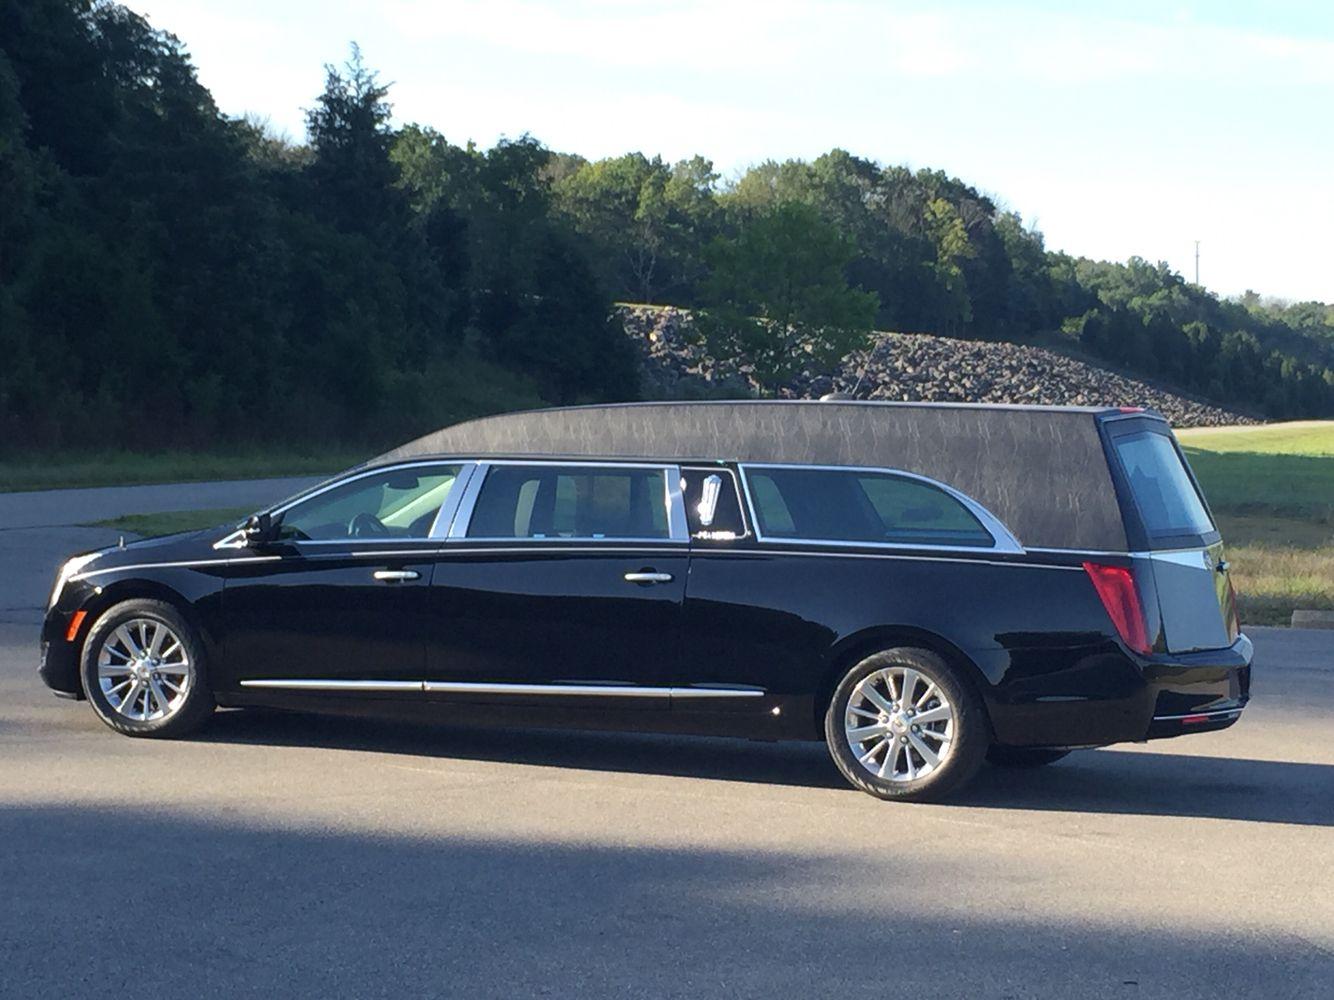 Platinum phoenix c hearse with full vinyl top